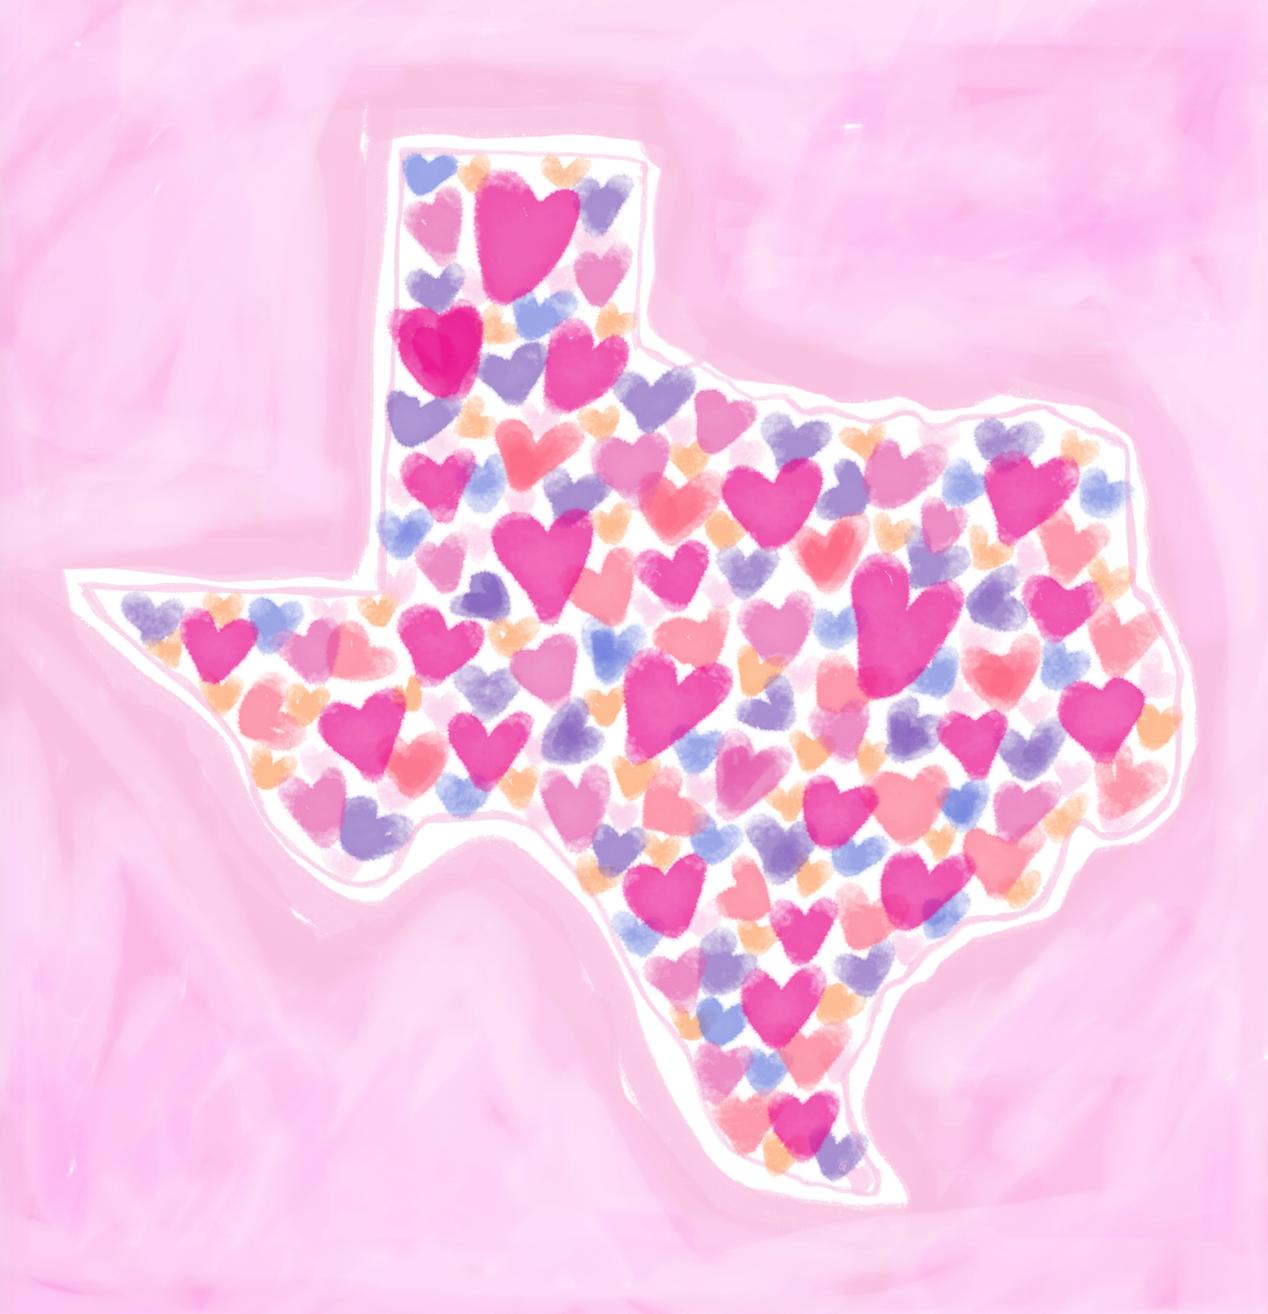 Texas State Heart Art by Chris Olson